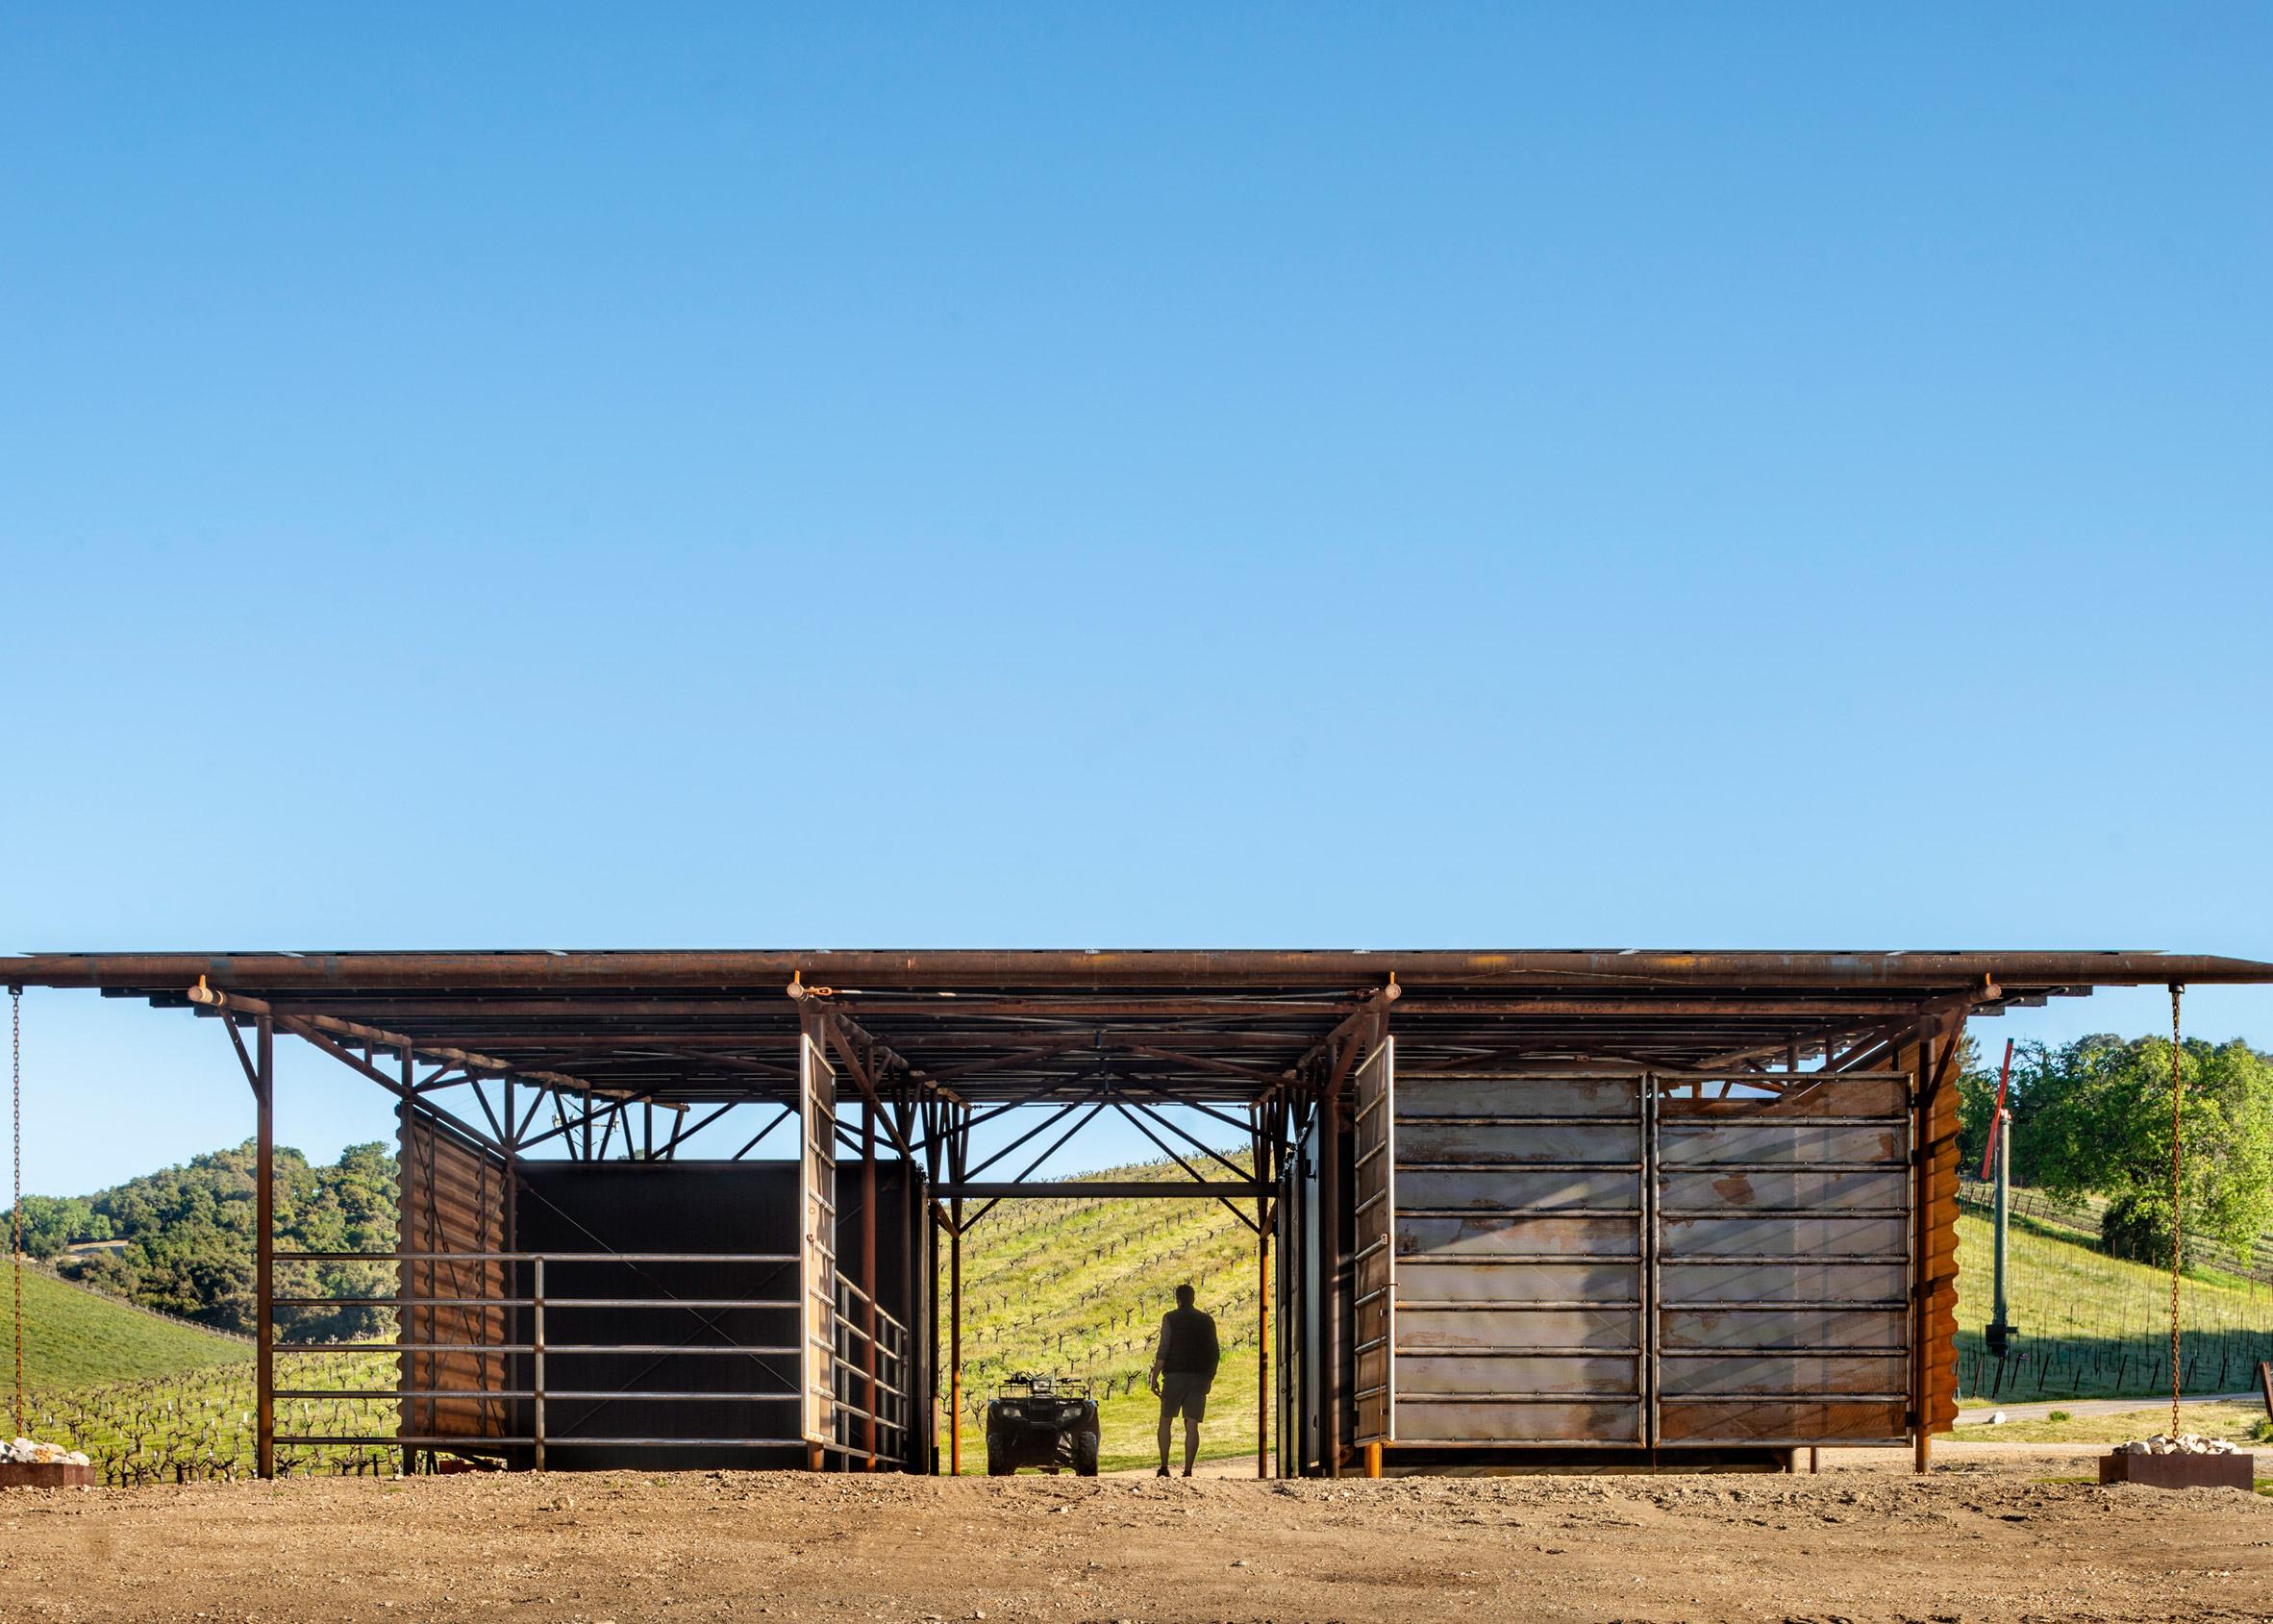 Saxum Vineyard Equipment Barn, Paso Robles, California by Clayton & Little Architects